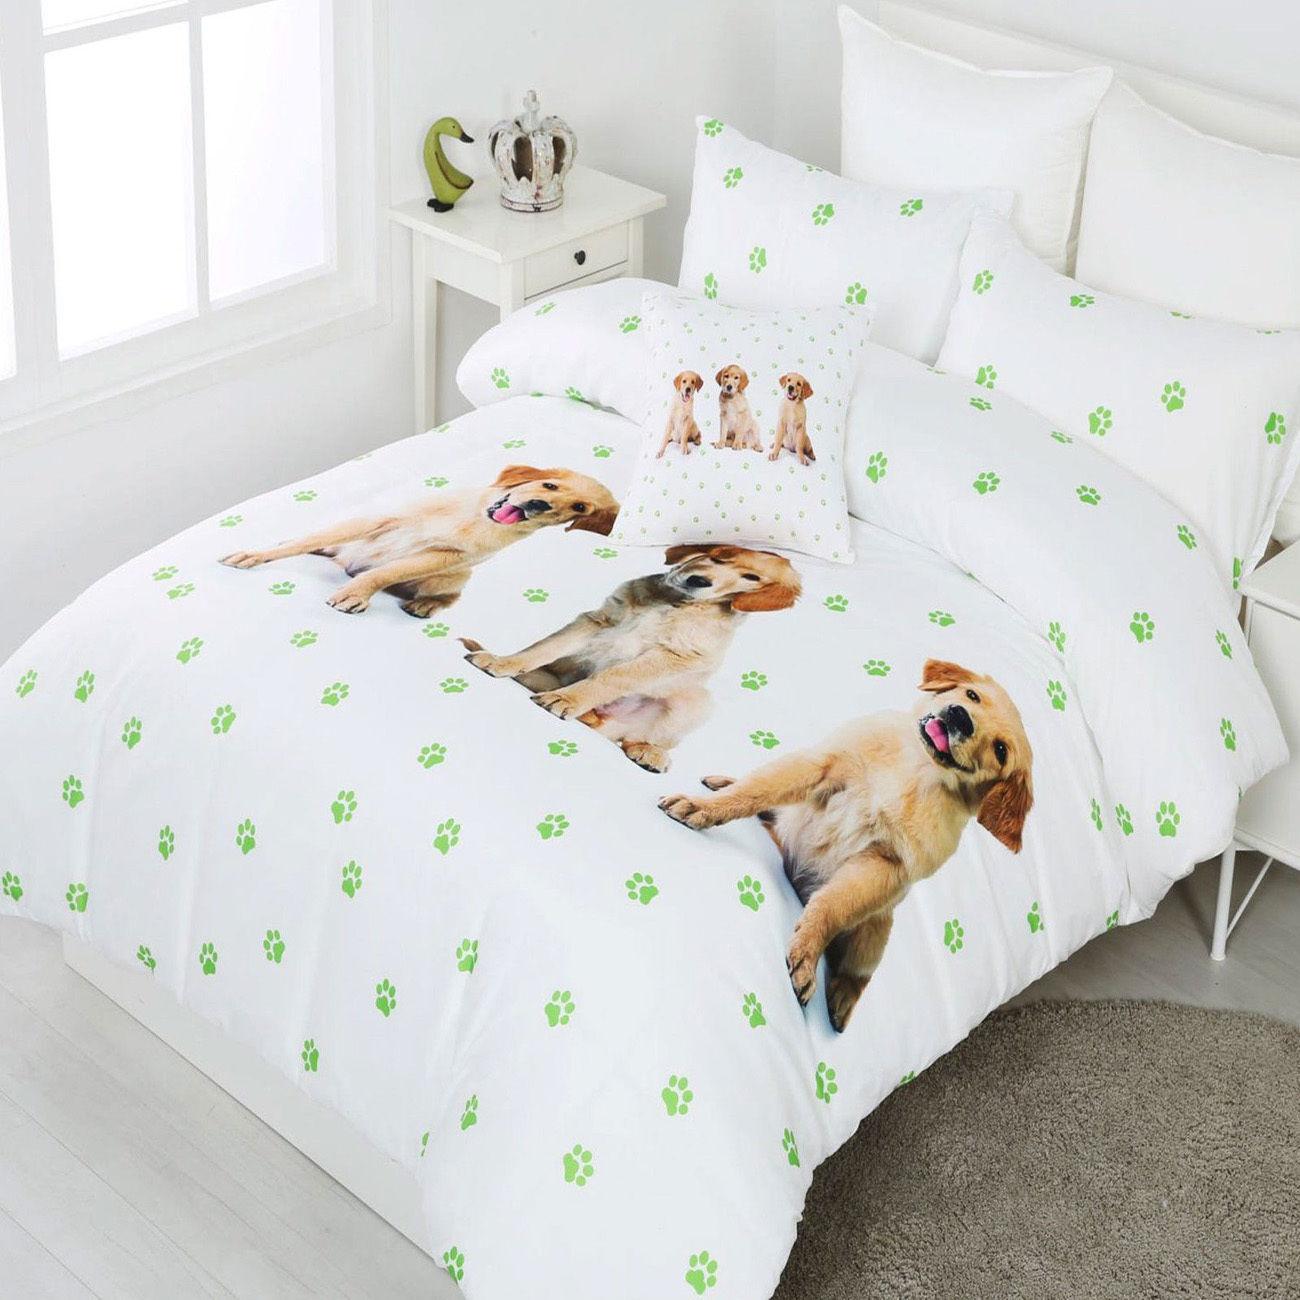 Spot the Dog Duvet   Doona   Quilt Cover Set   Labrador Puppy   Grün Paws